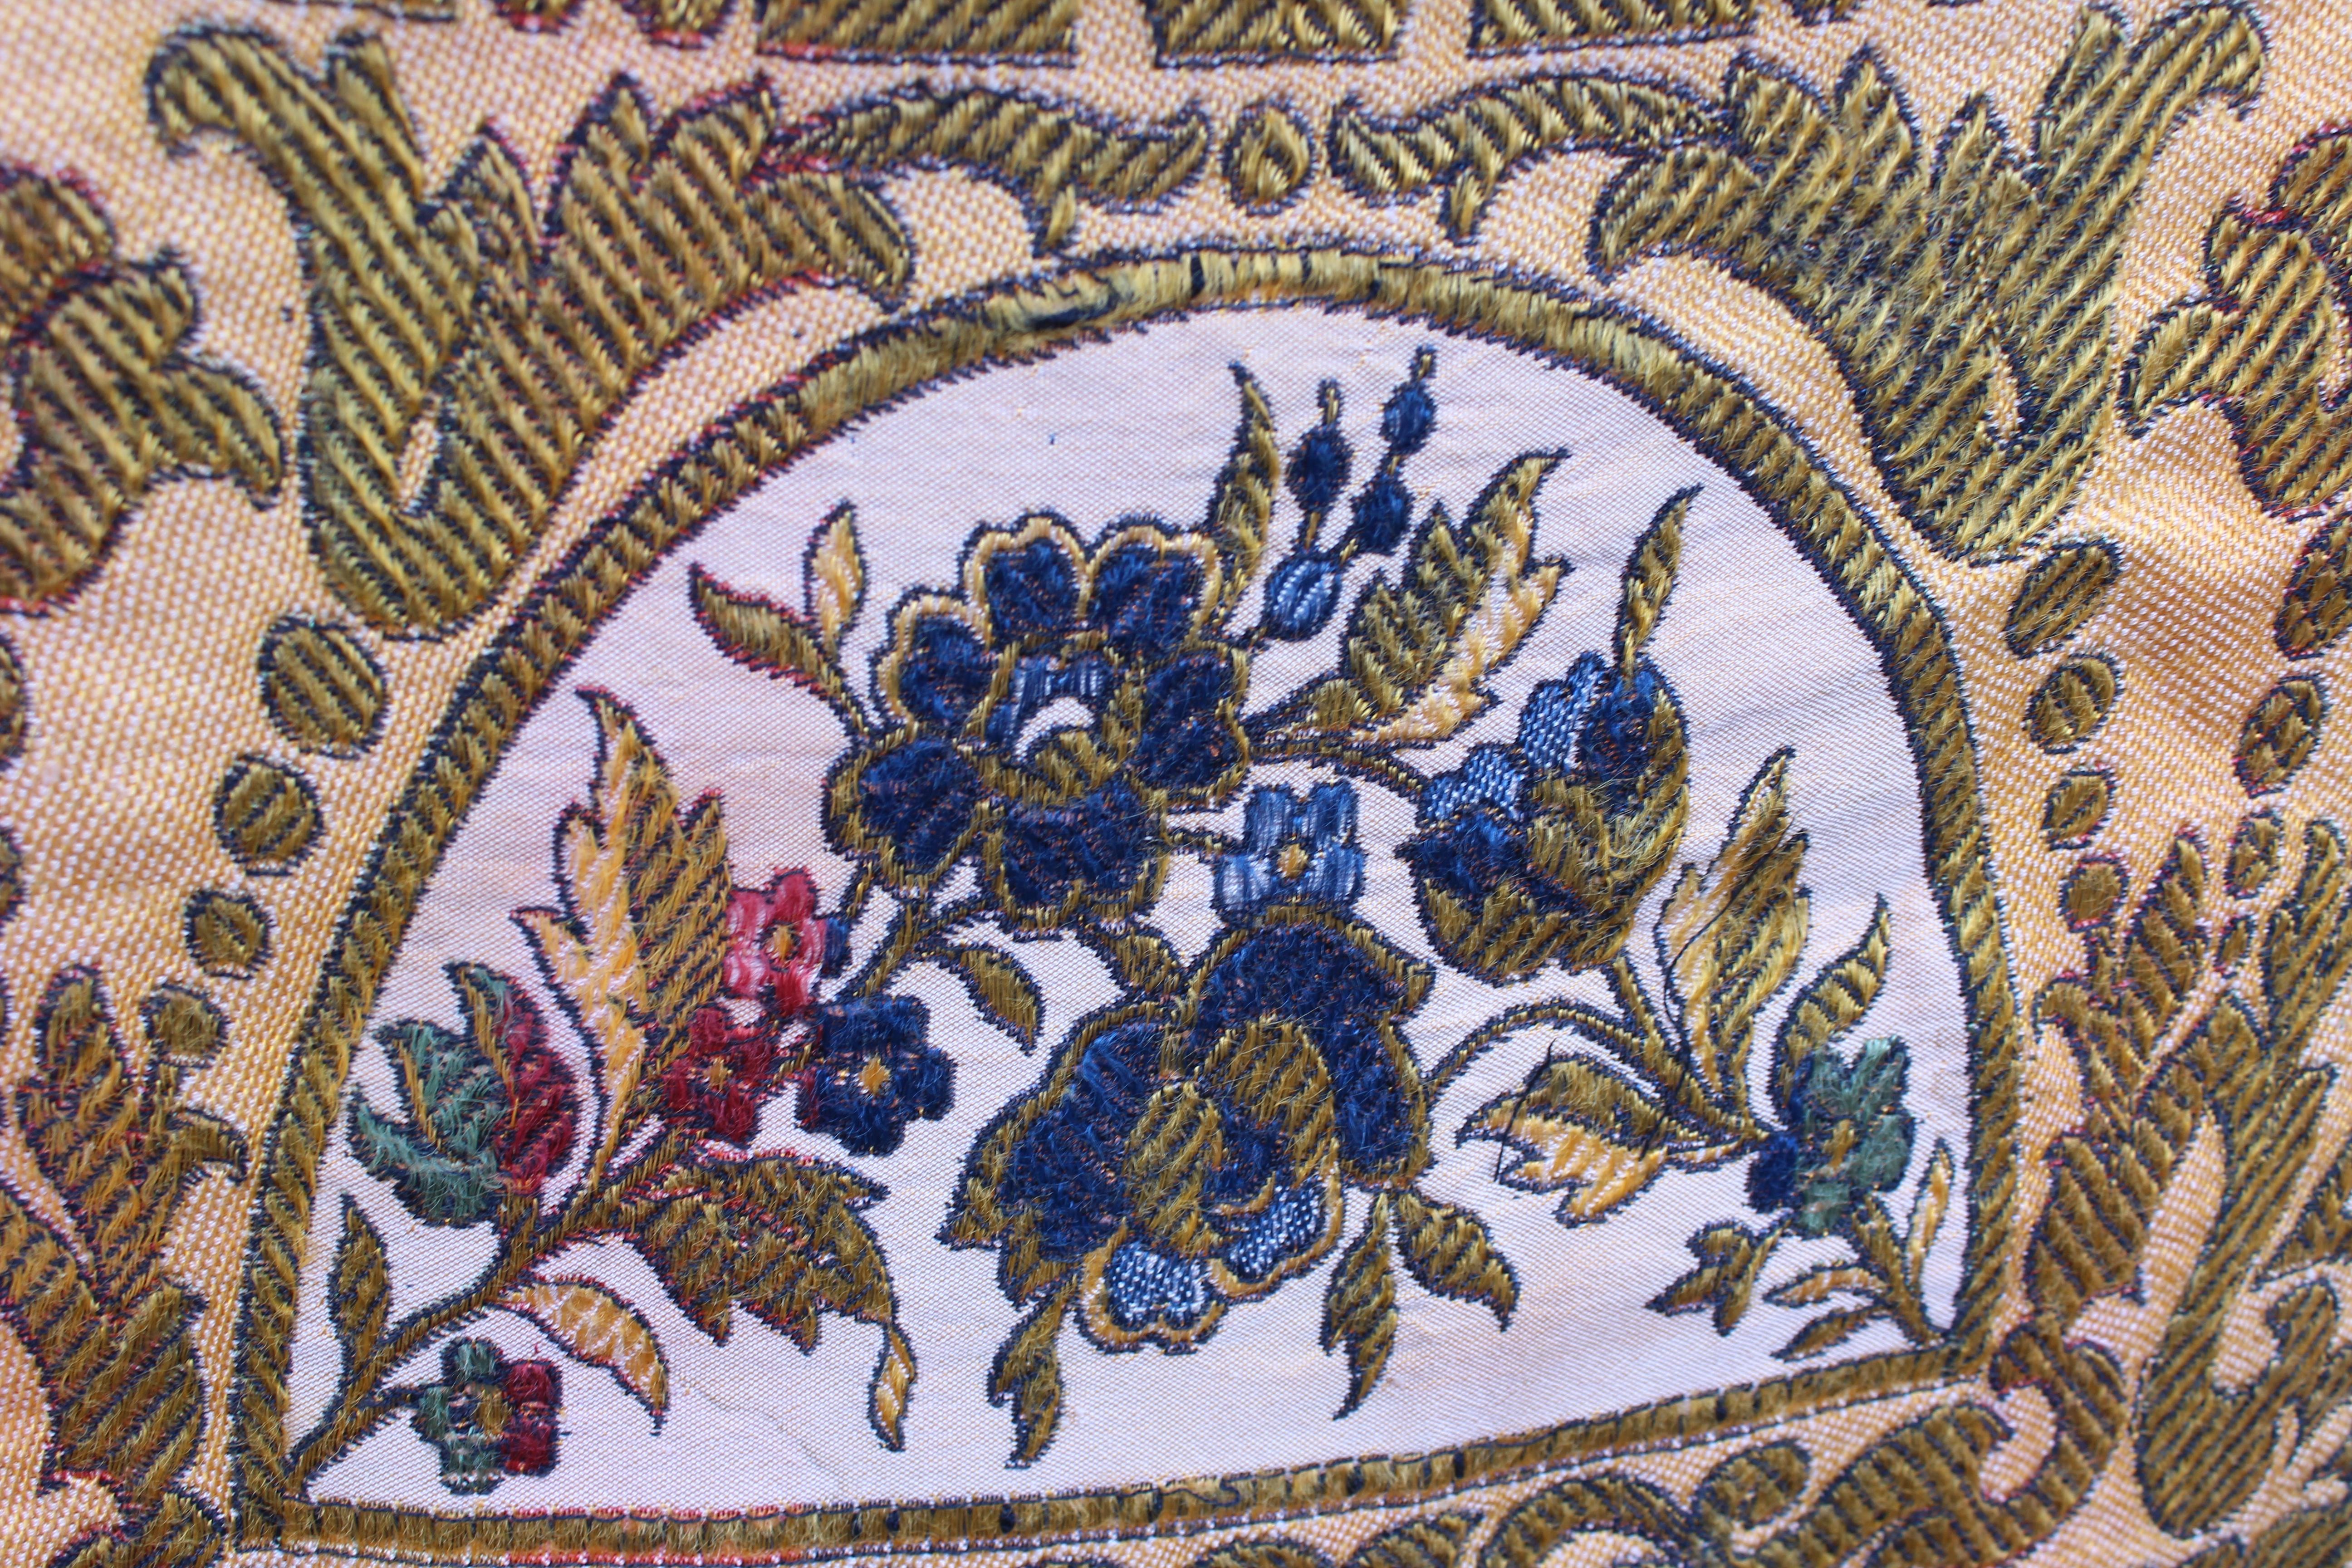 Antigüedades: ANTIGUO MANTEL TAPETE TAPIZ , HILOS DE ALGODÓN Y SEDA ESCENA TOREROS TOROS PLAZAS - Foto 4 - 108437623